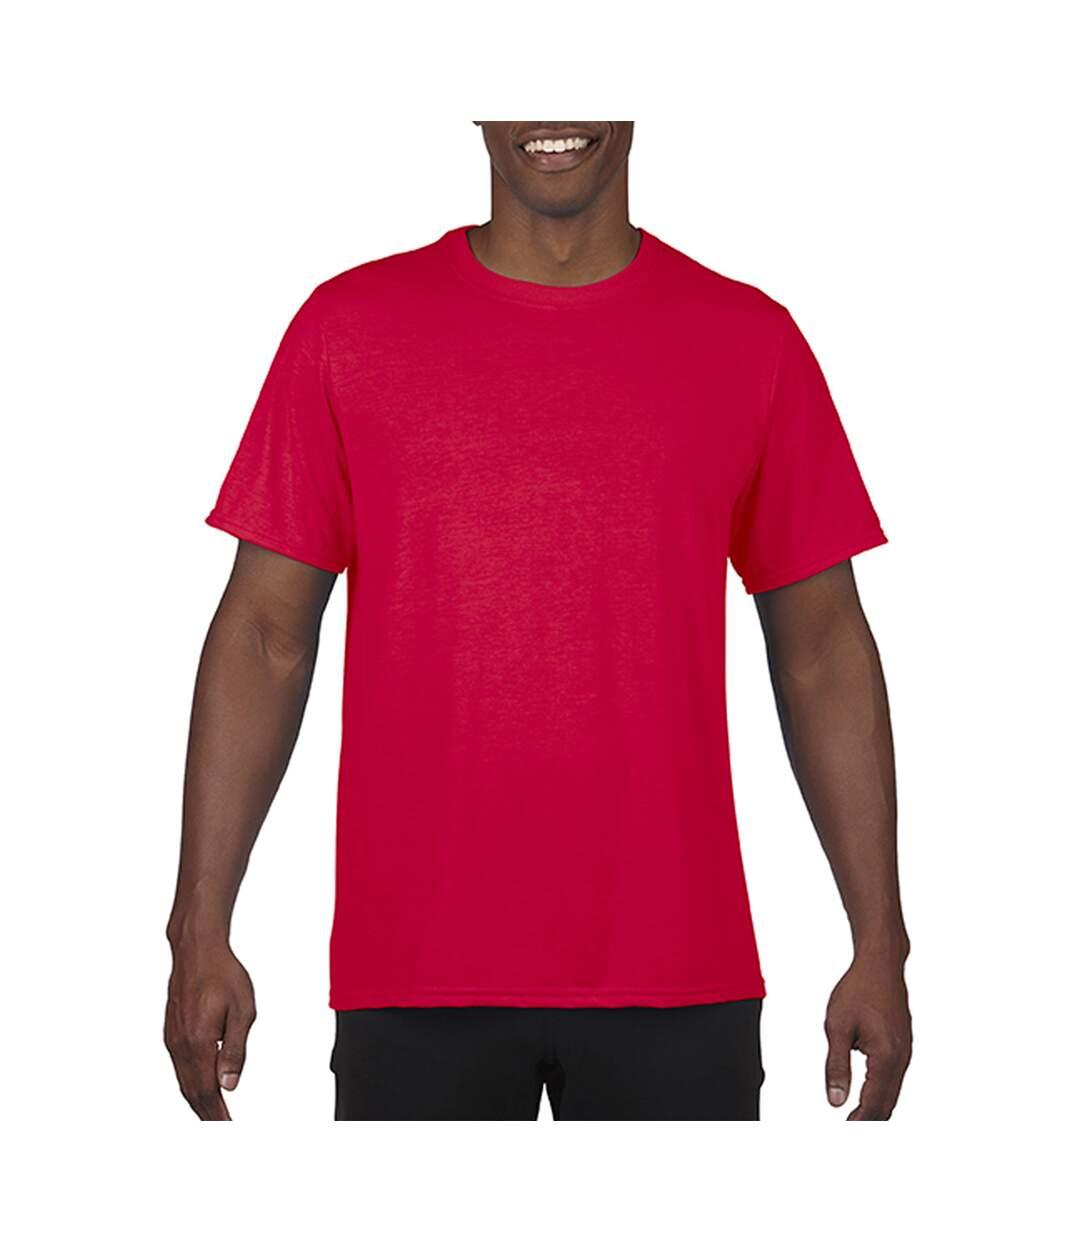 Gildan Mens Core Short Sleeve Moisture Wicking T-Shirt (Sport Scarlet Red) - UTBC3715